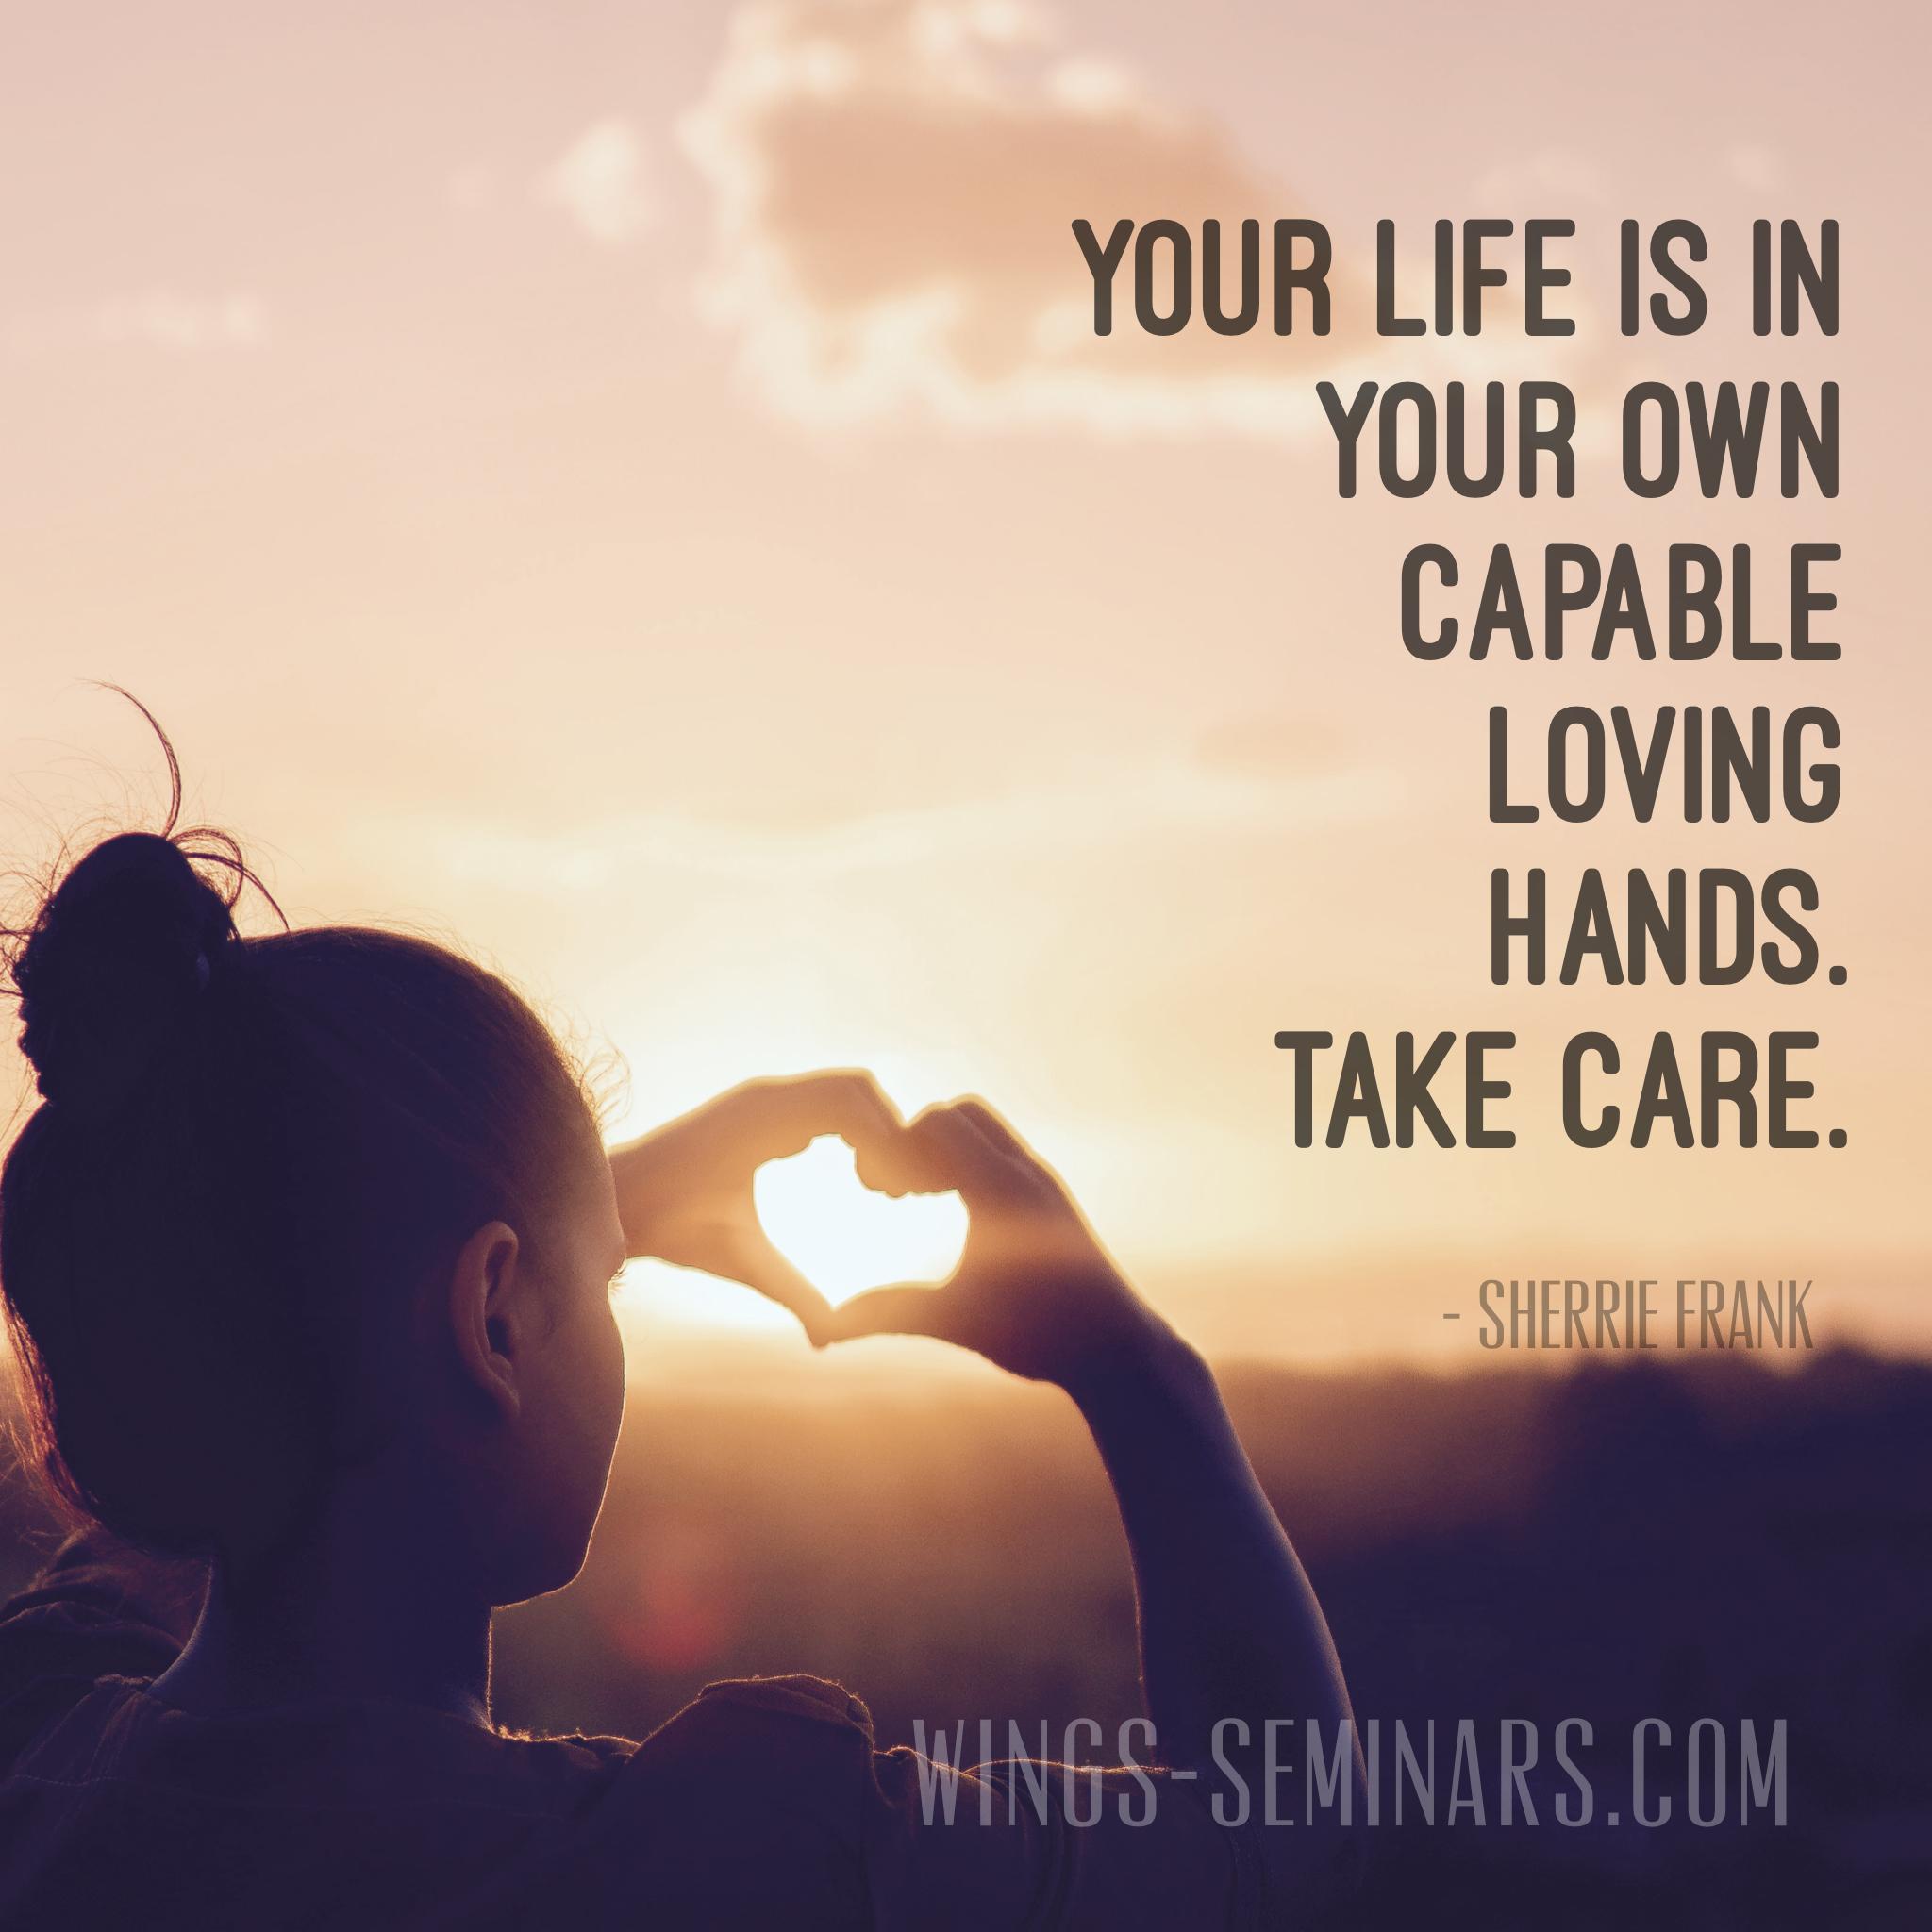 Capable Loving Hands